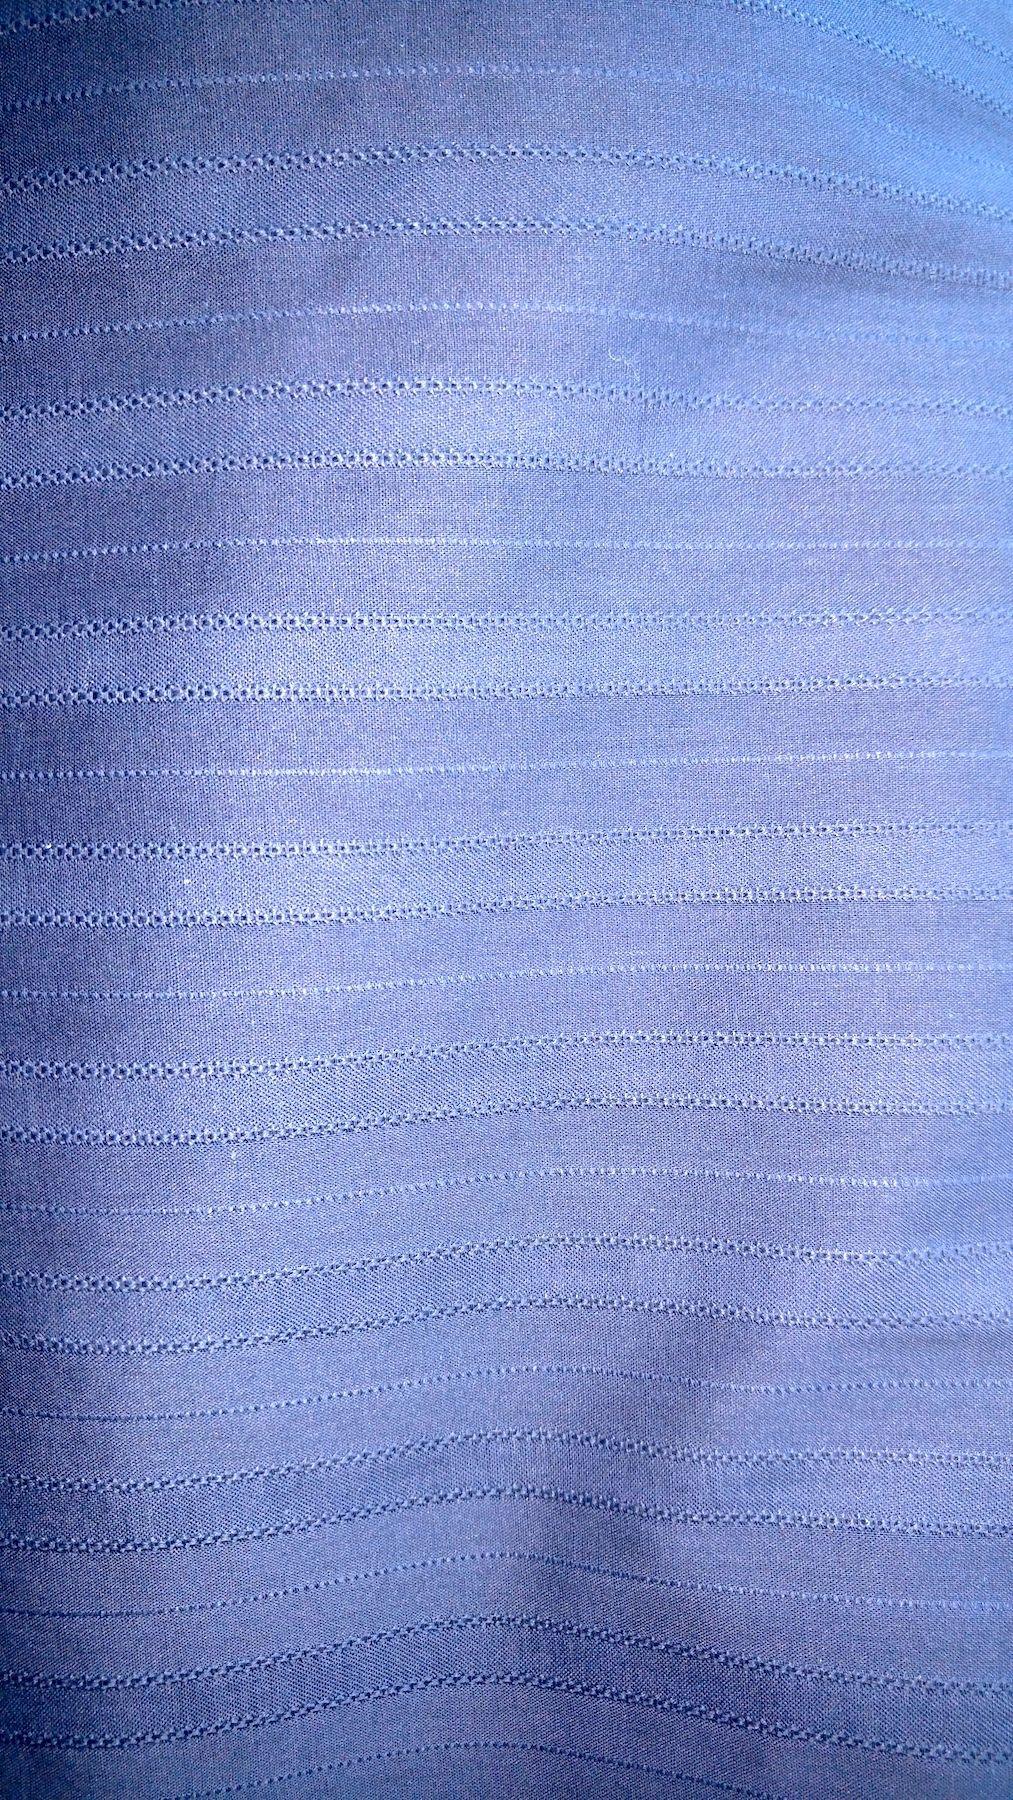 Deep Navy Blue Striped Cotton Jacquard Weave Shirting